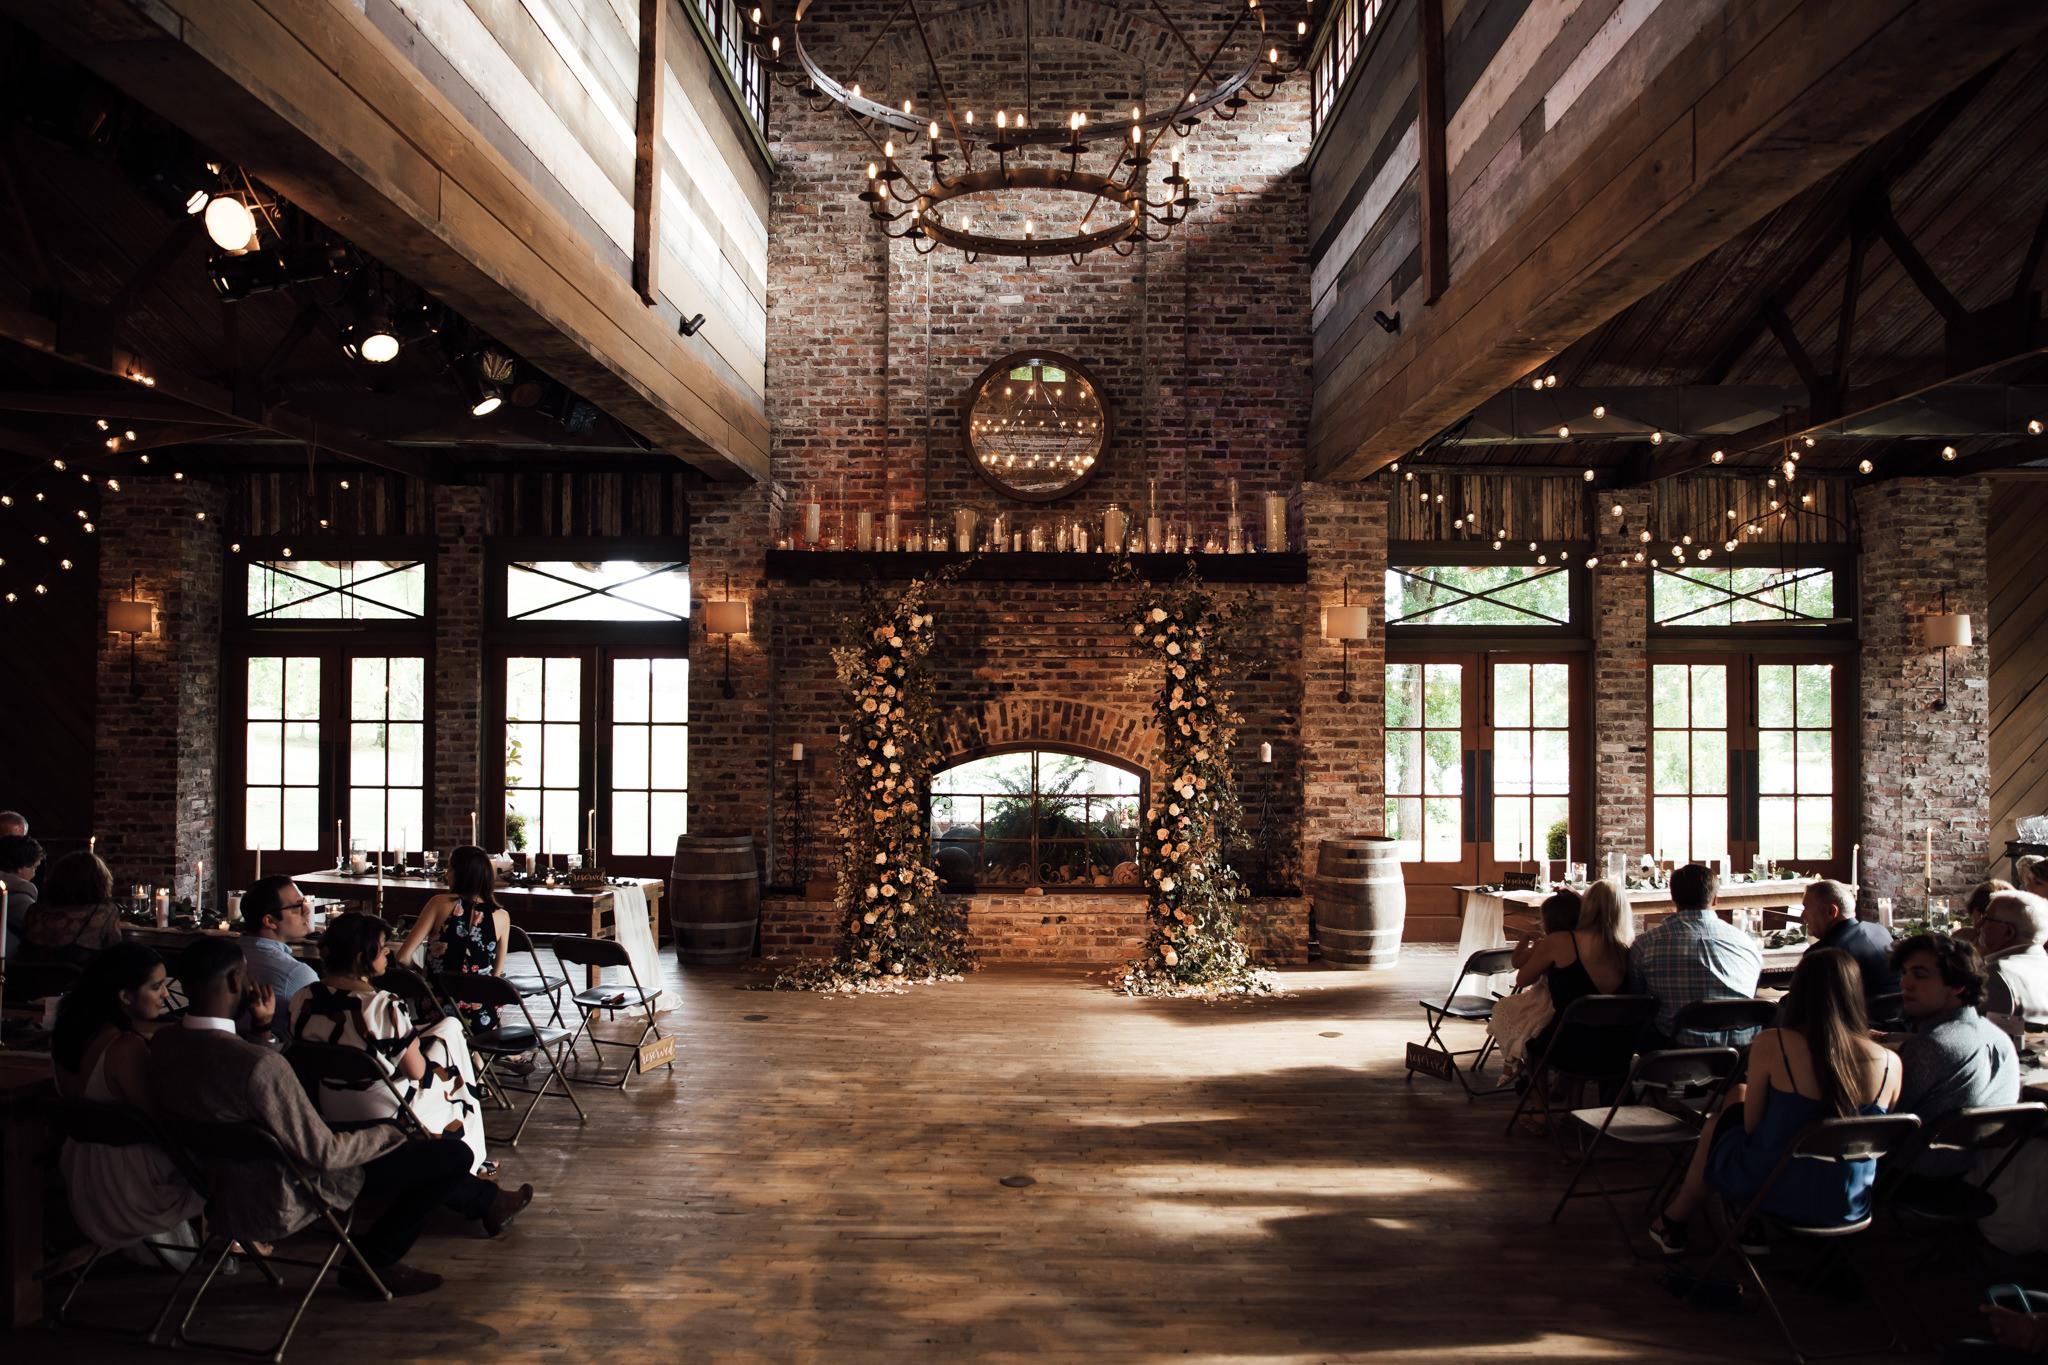 phantom-canyon-brewery-colorado-springs-wedding-photographer-386.jpg